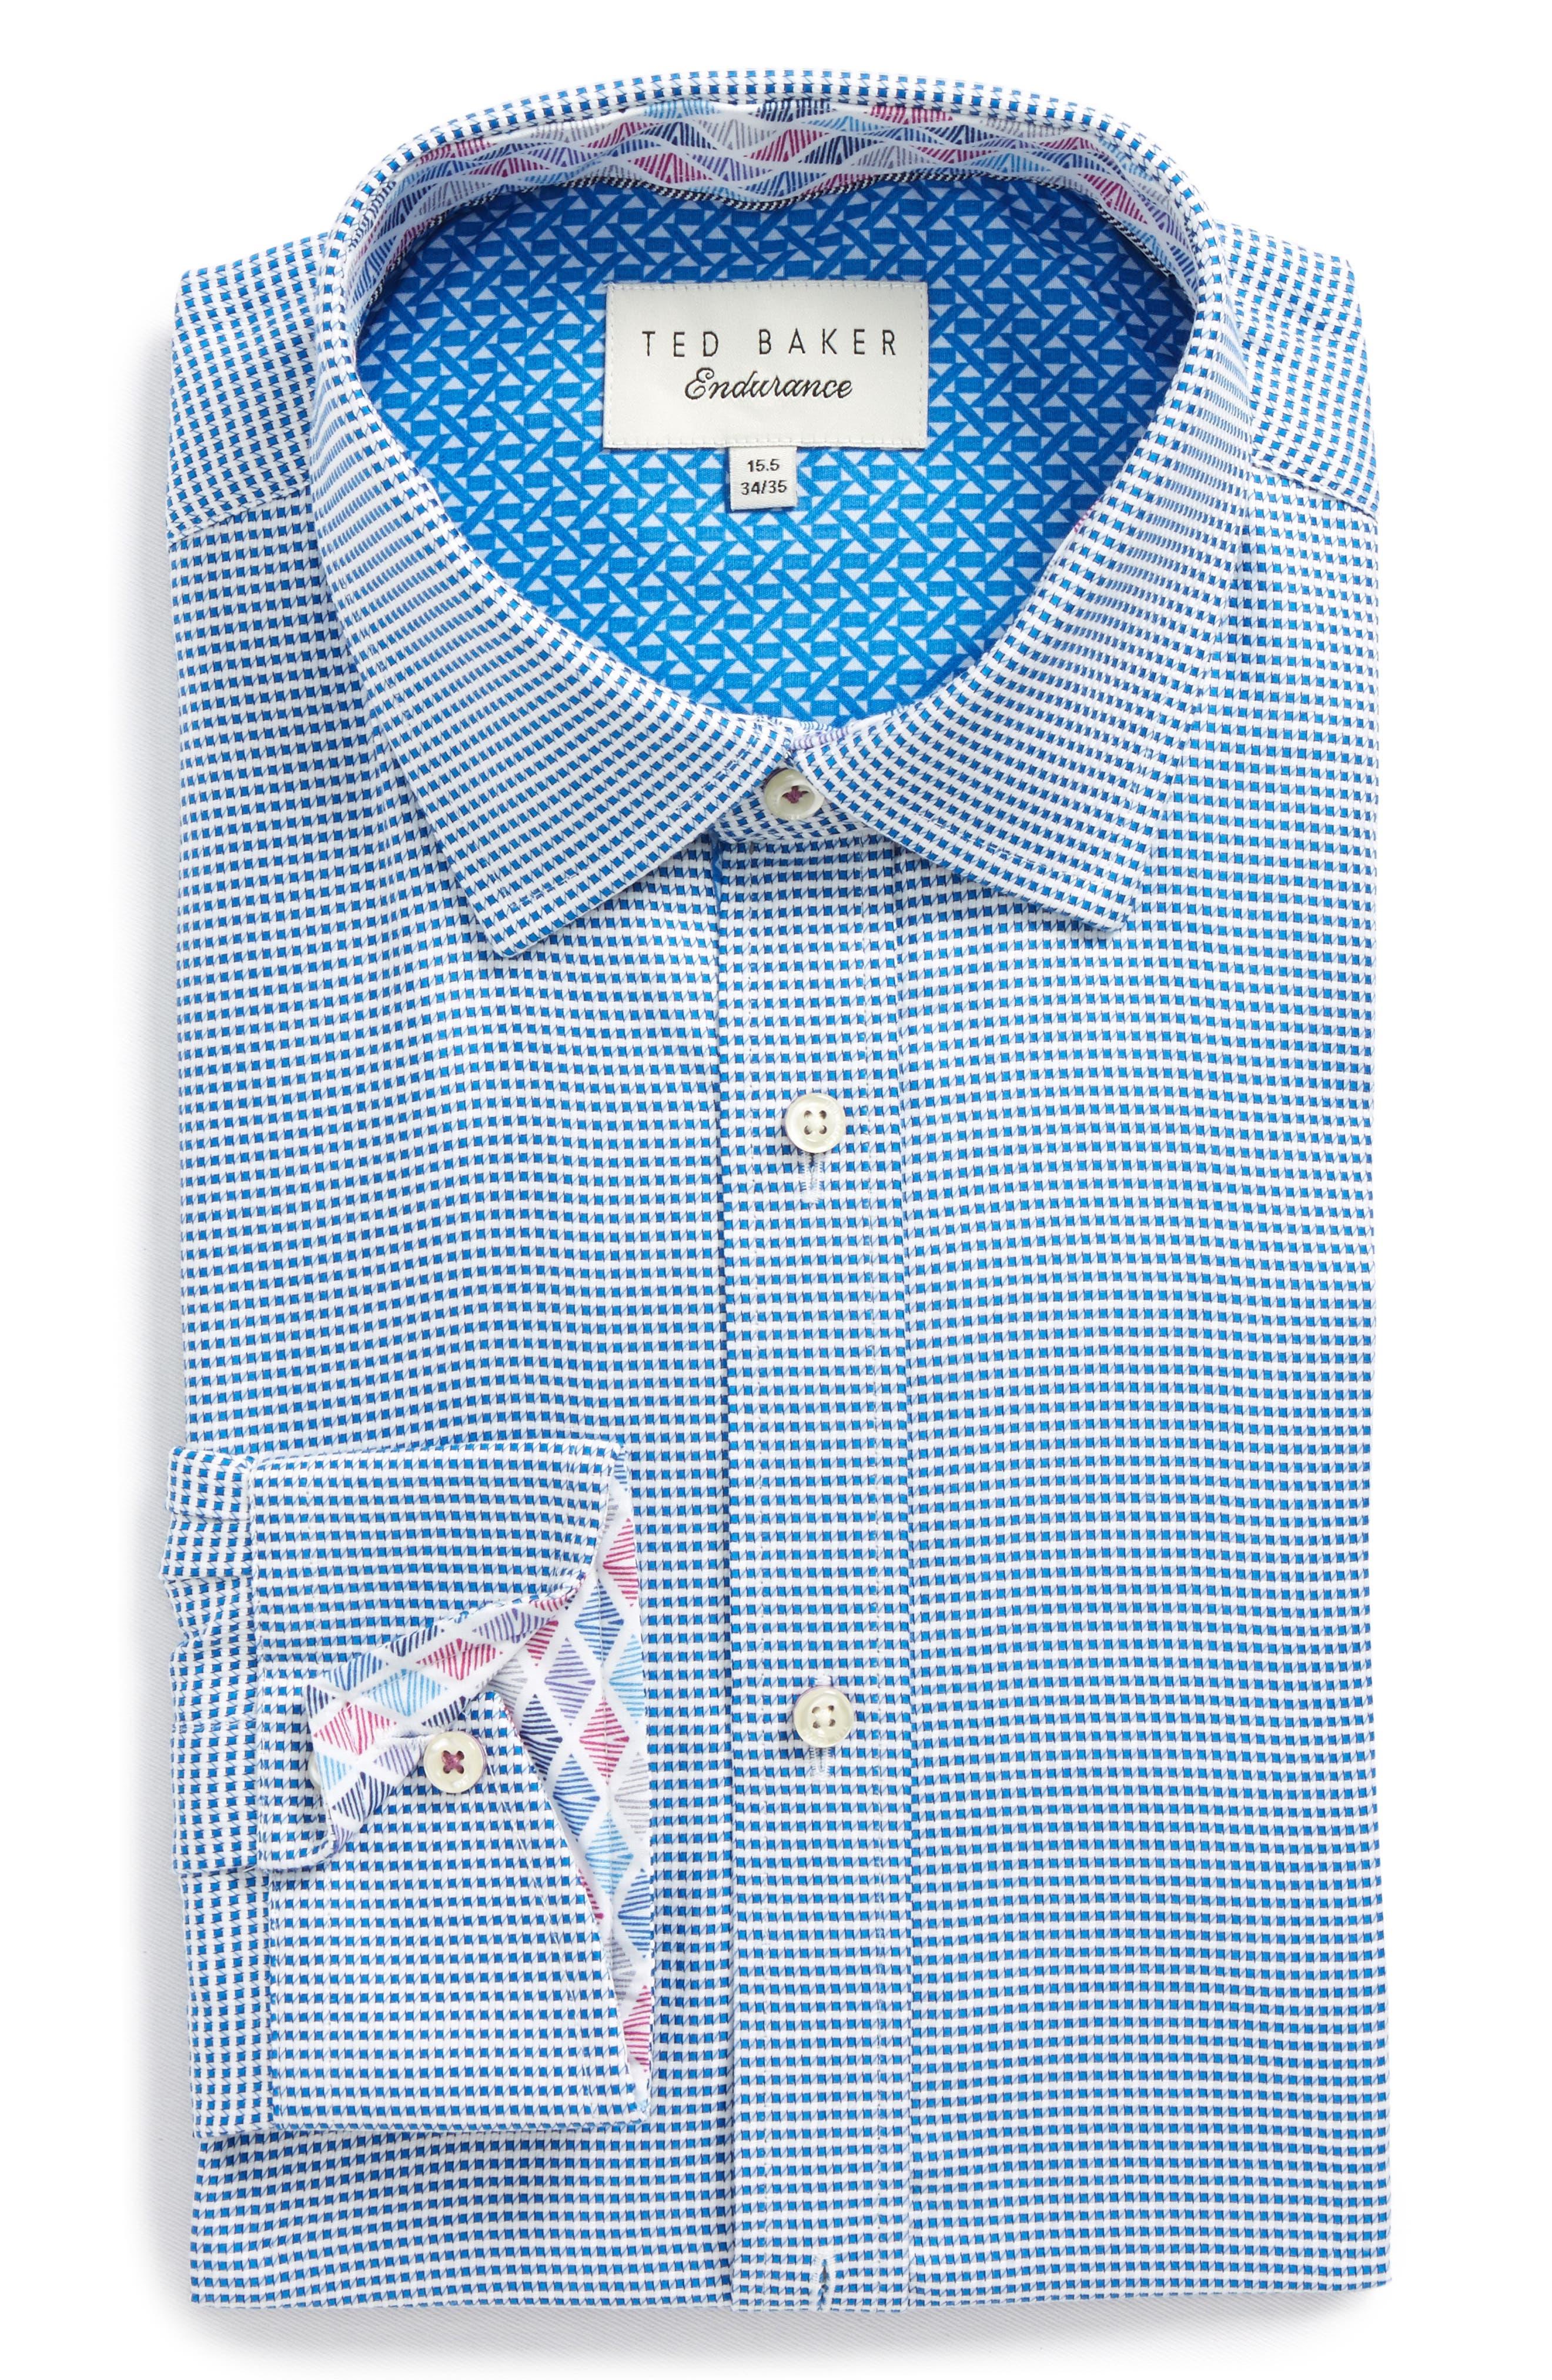 Endurance Giara Trim Fit Dress Shirt,                         Main,                         color, Blue